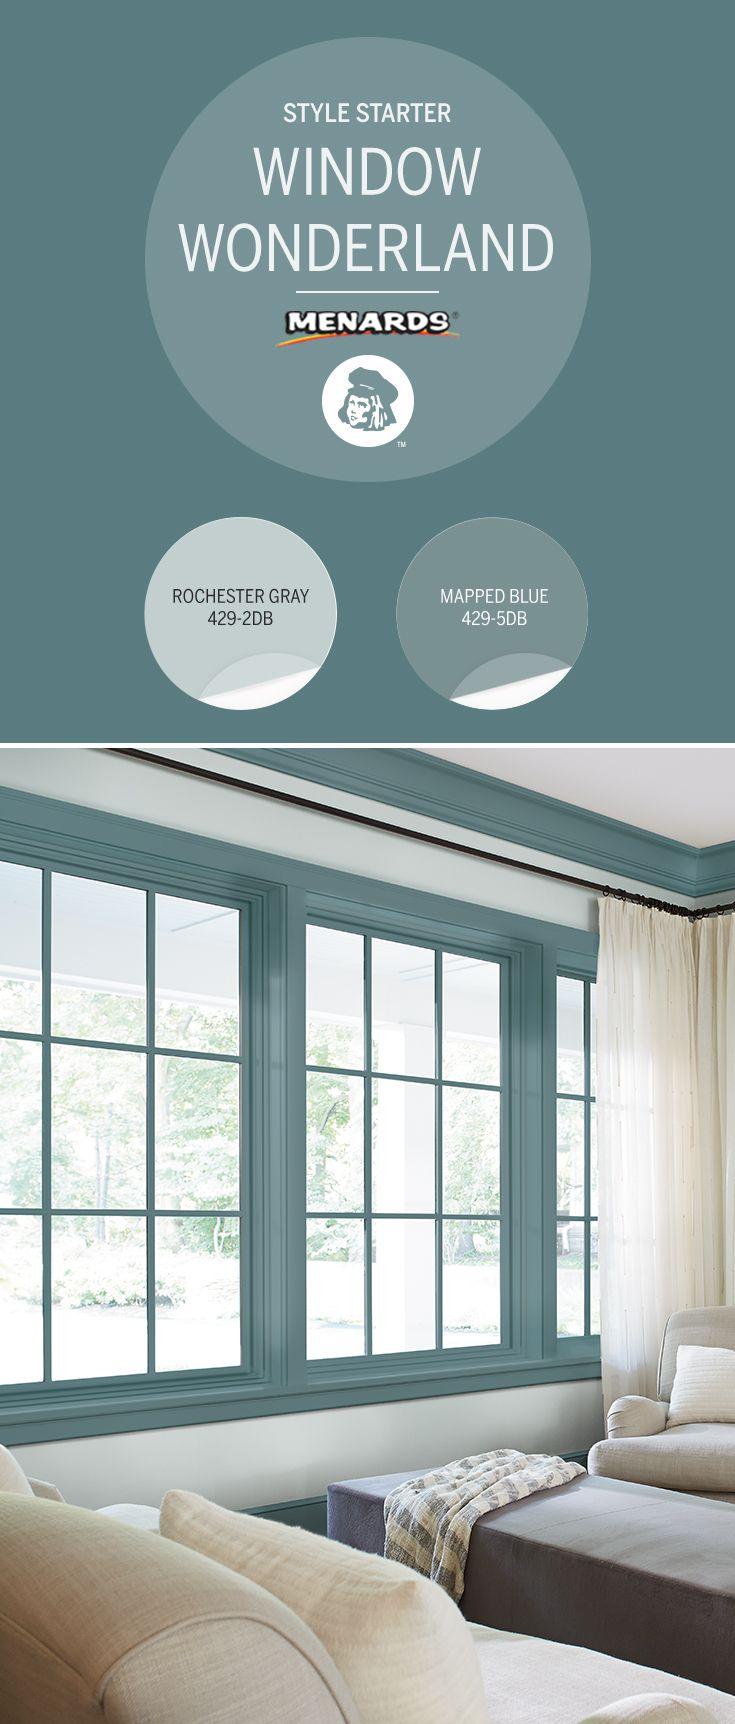 Menards Paint Colors Interior - home decor - Myjihad.us